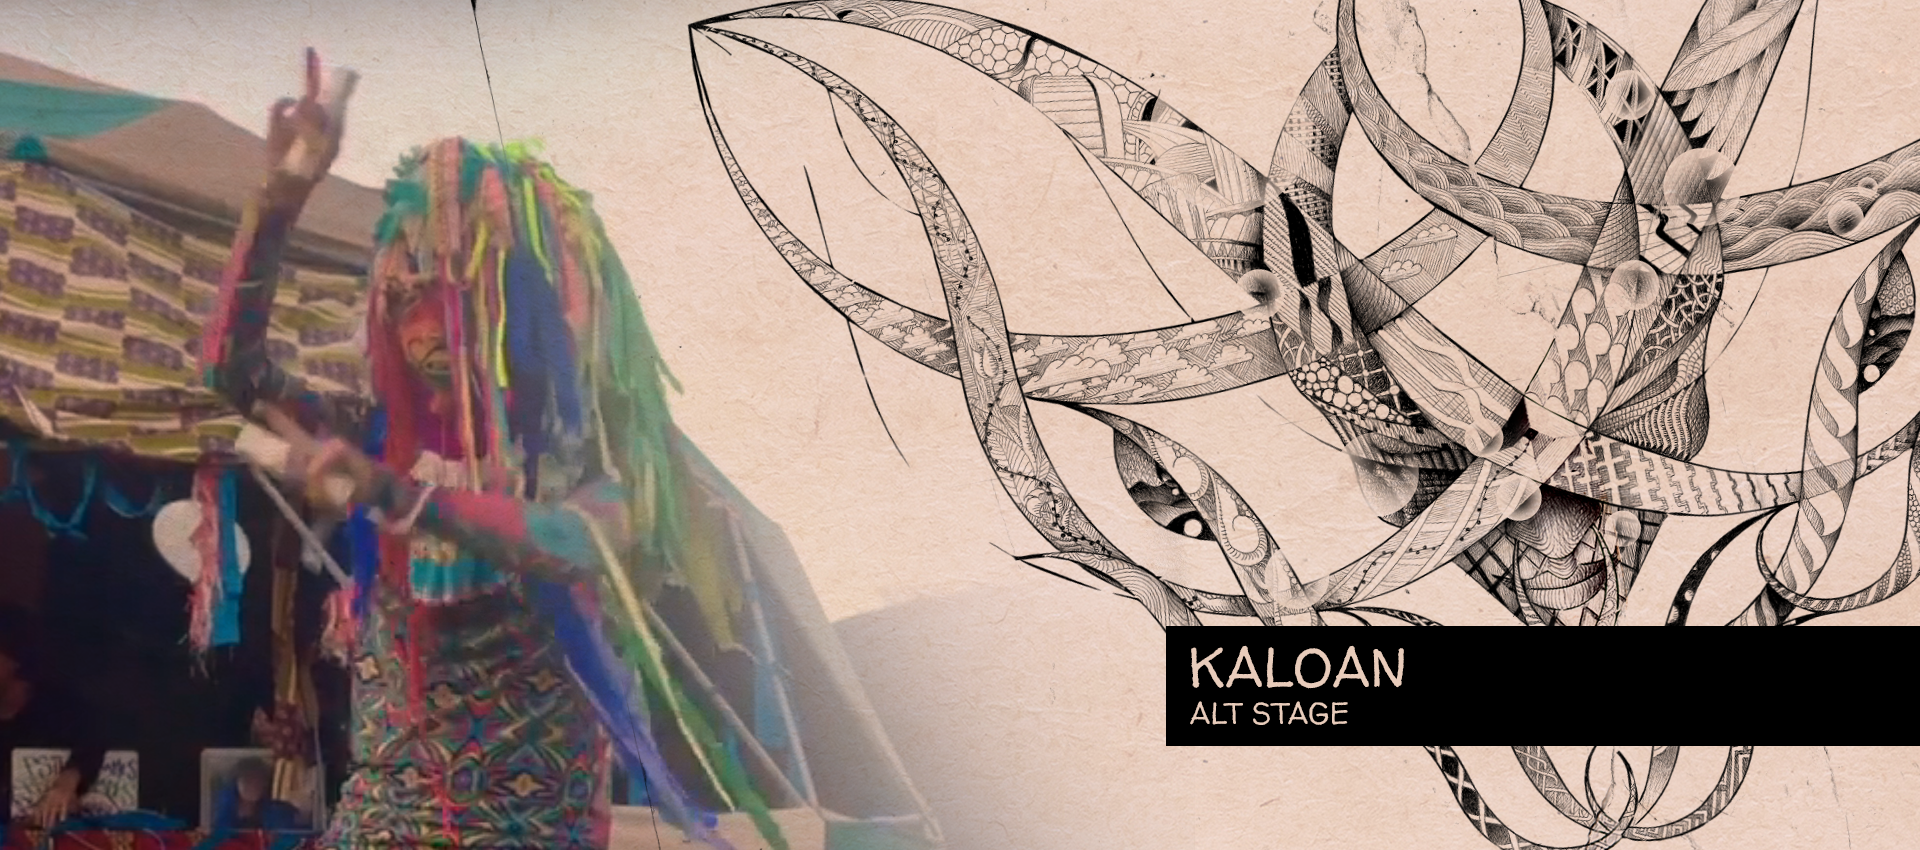 Kaloan